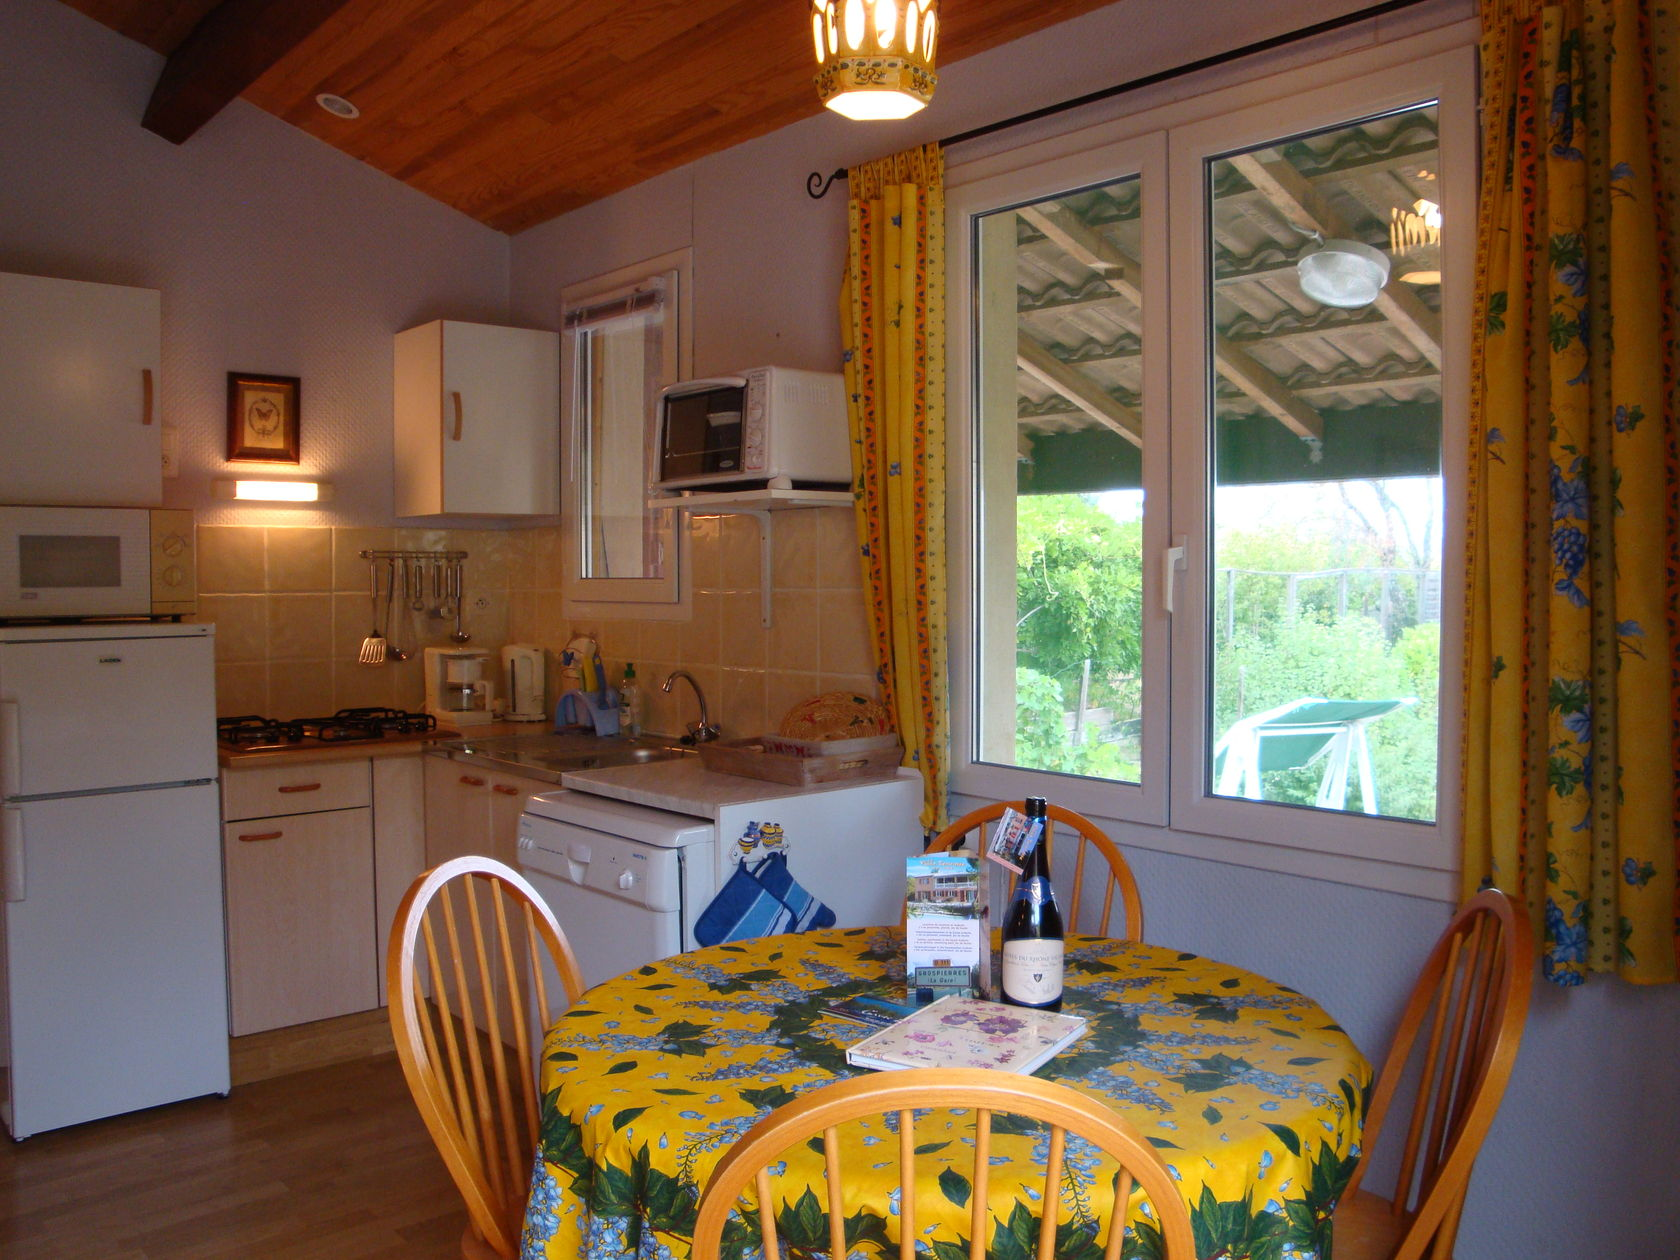 Bekijk vakantiehuis Papillon in Ardèche - Rhône-Alpes - Gites.nl